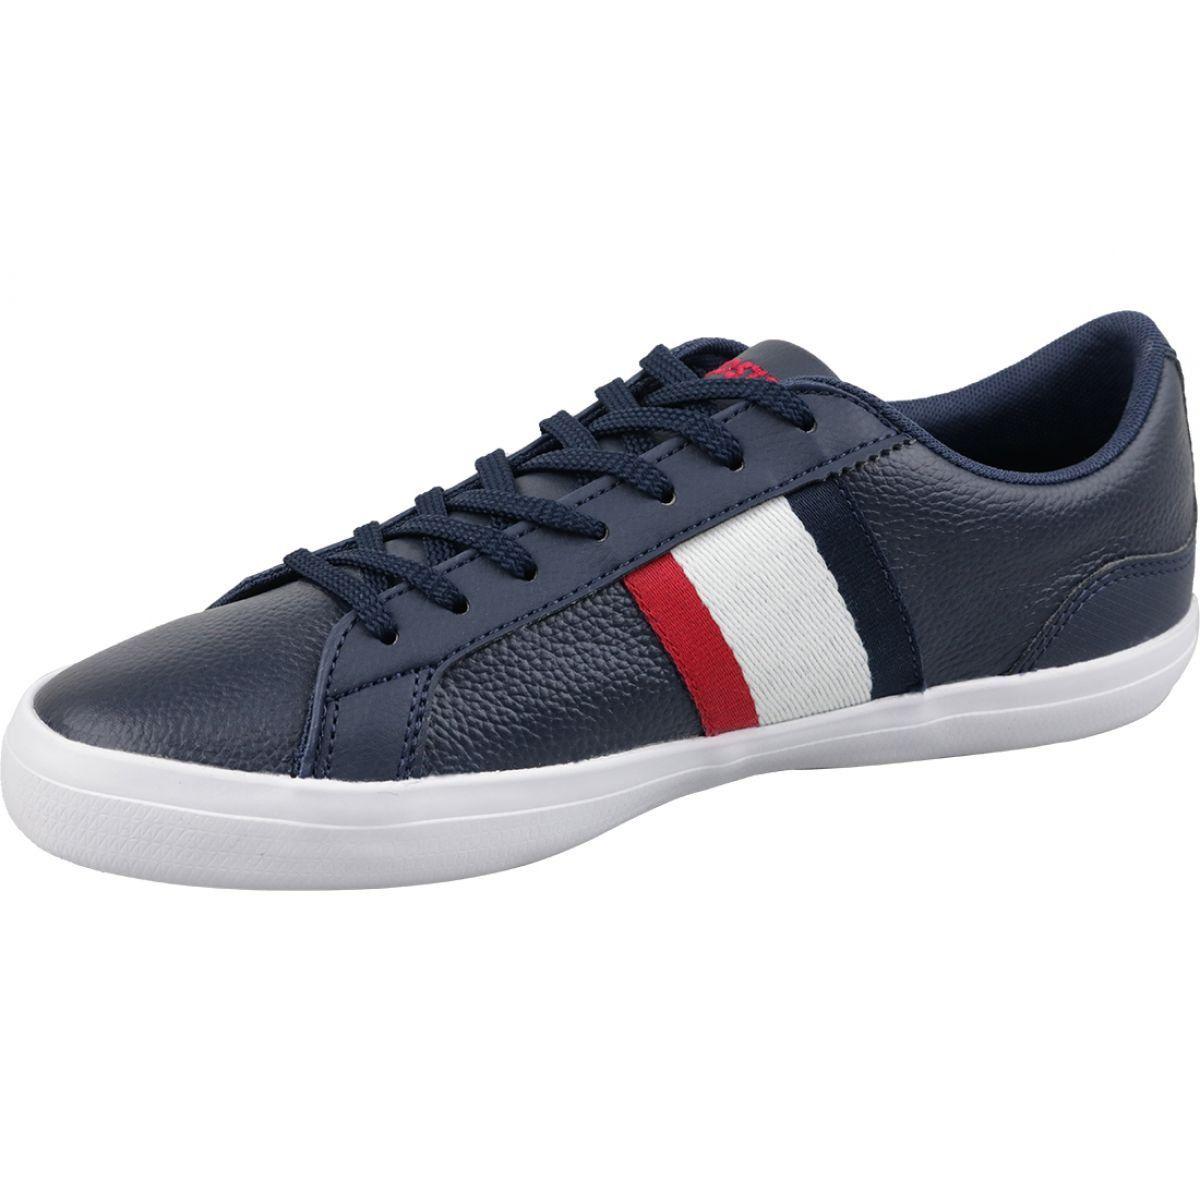 Buty Lacoste Lerond 119 M 737cma00457a2 Biale Czerwone Granatowe Lacoste Fashion Shoes